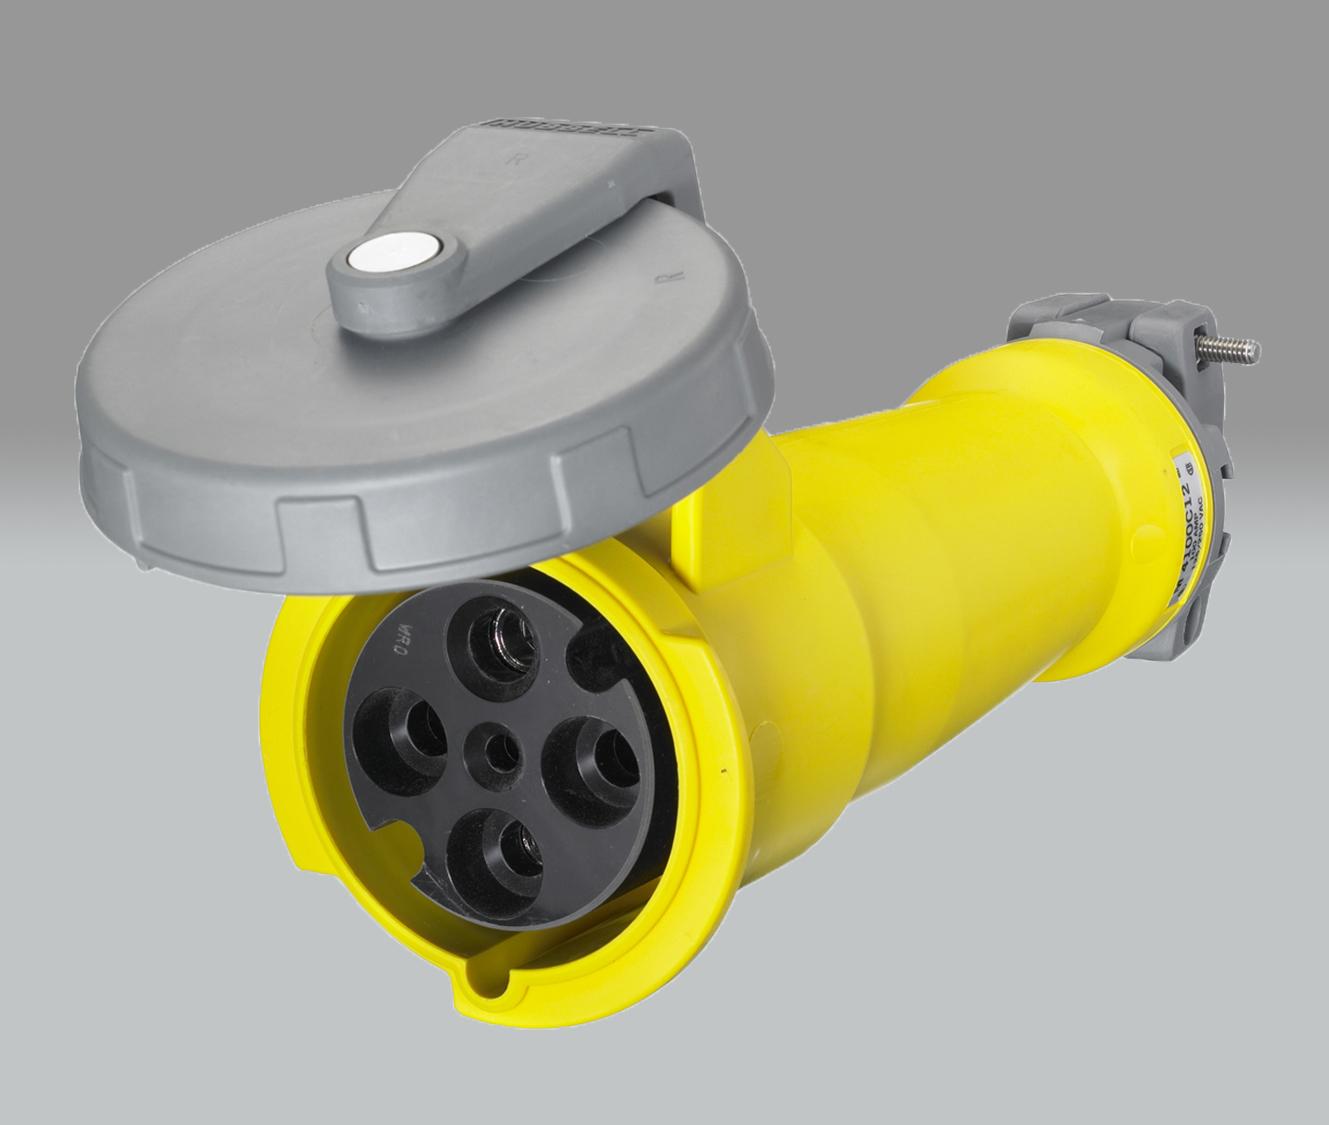 hight resolution of hubbell m4100c12 100 amp 125 250v female